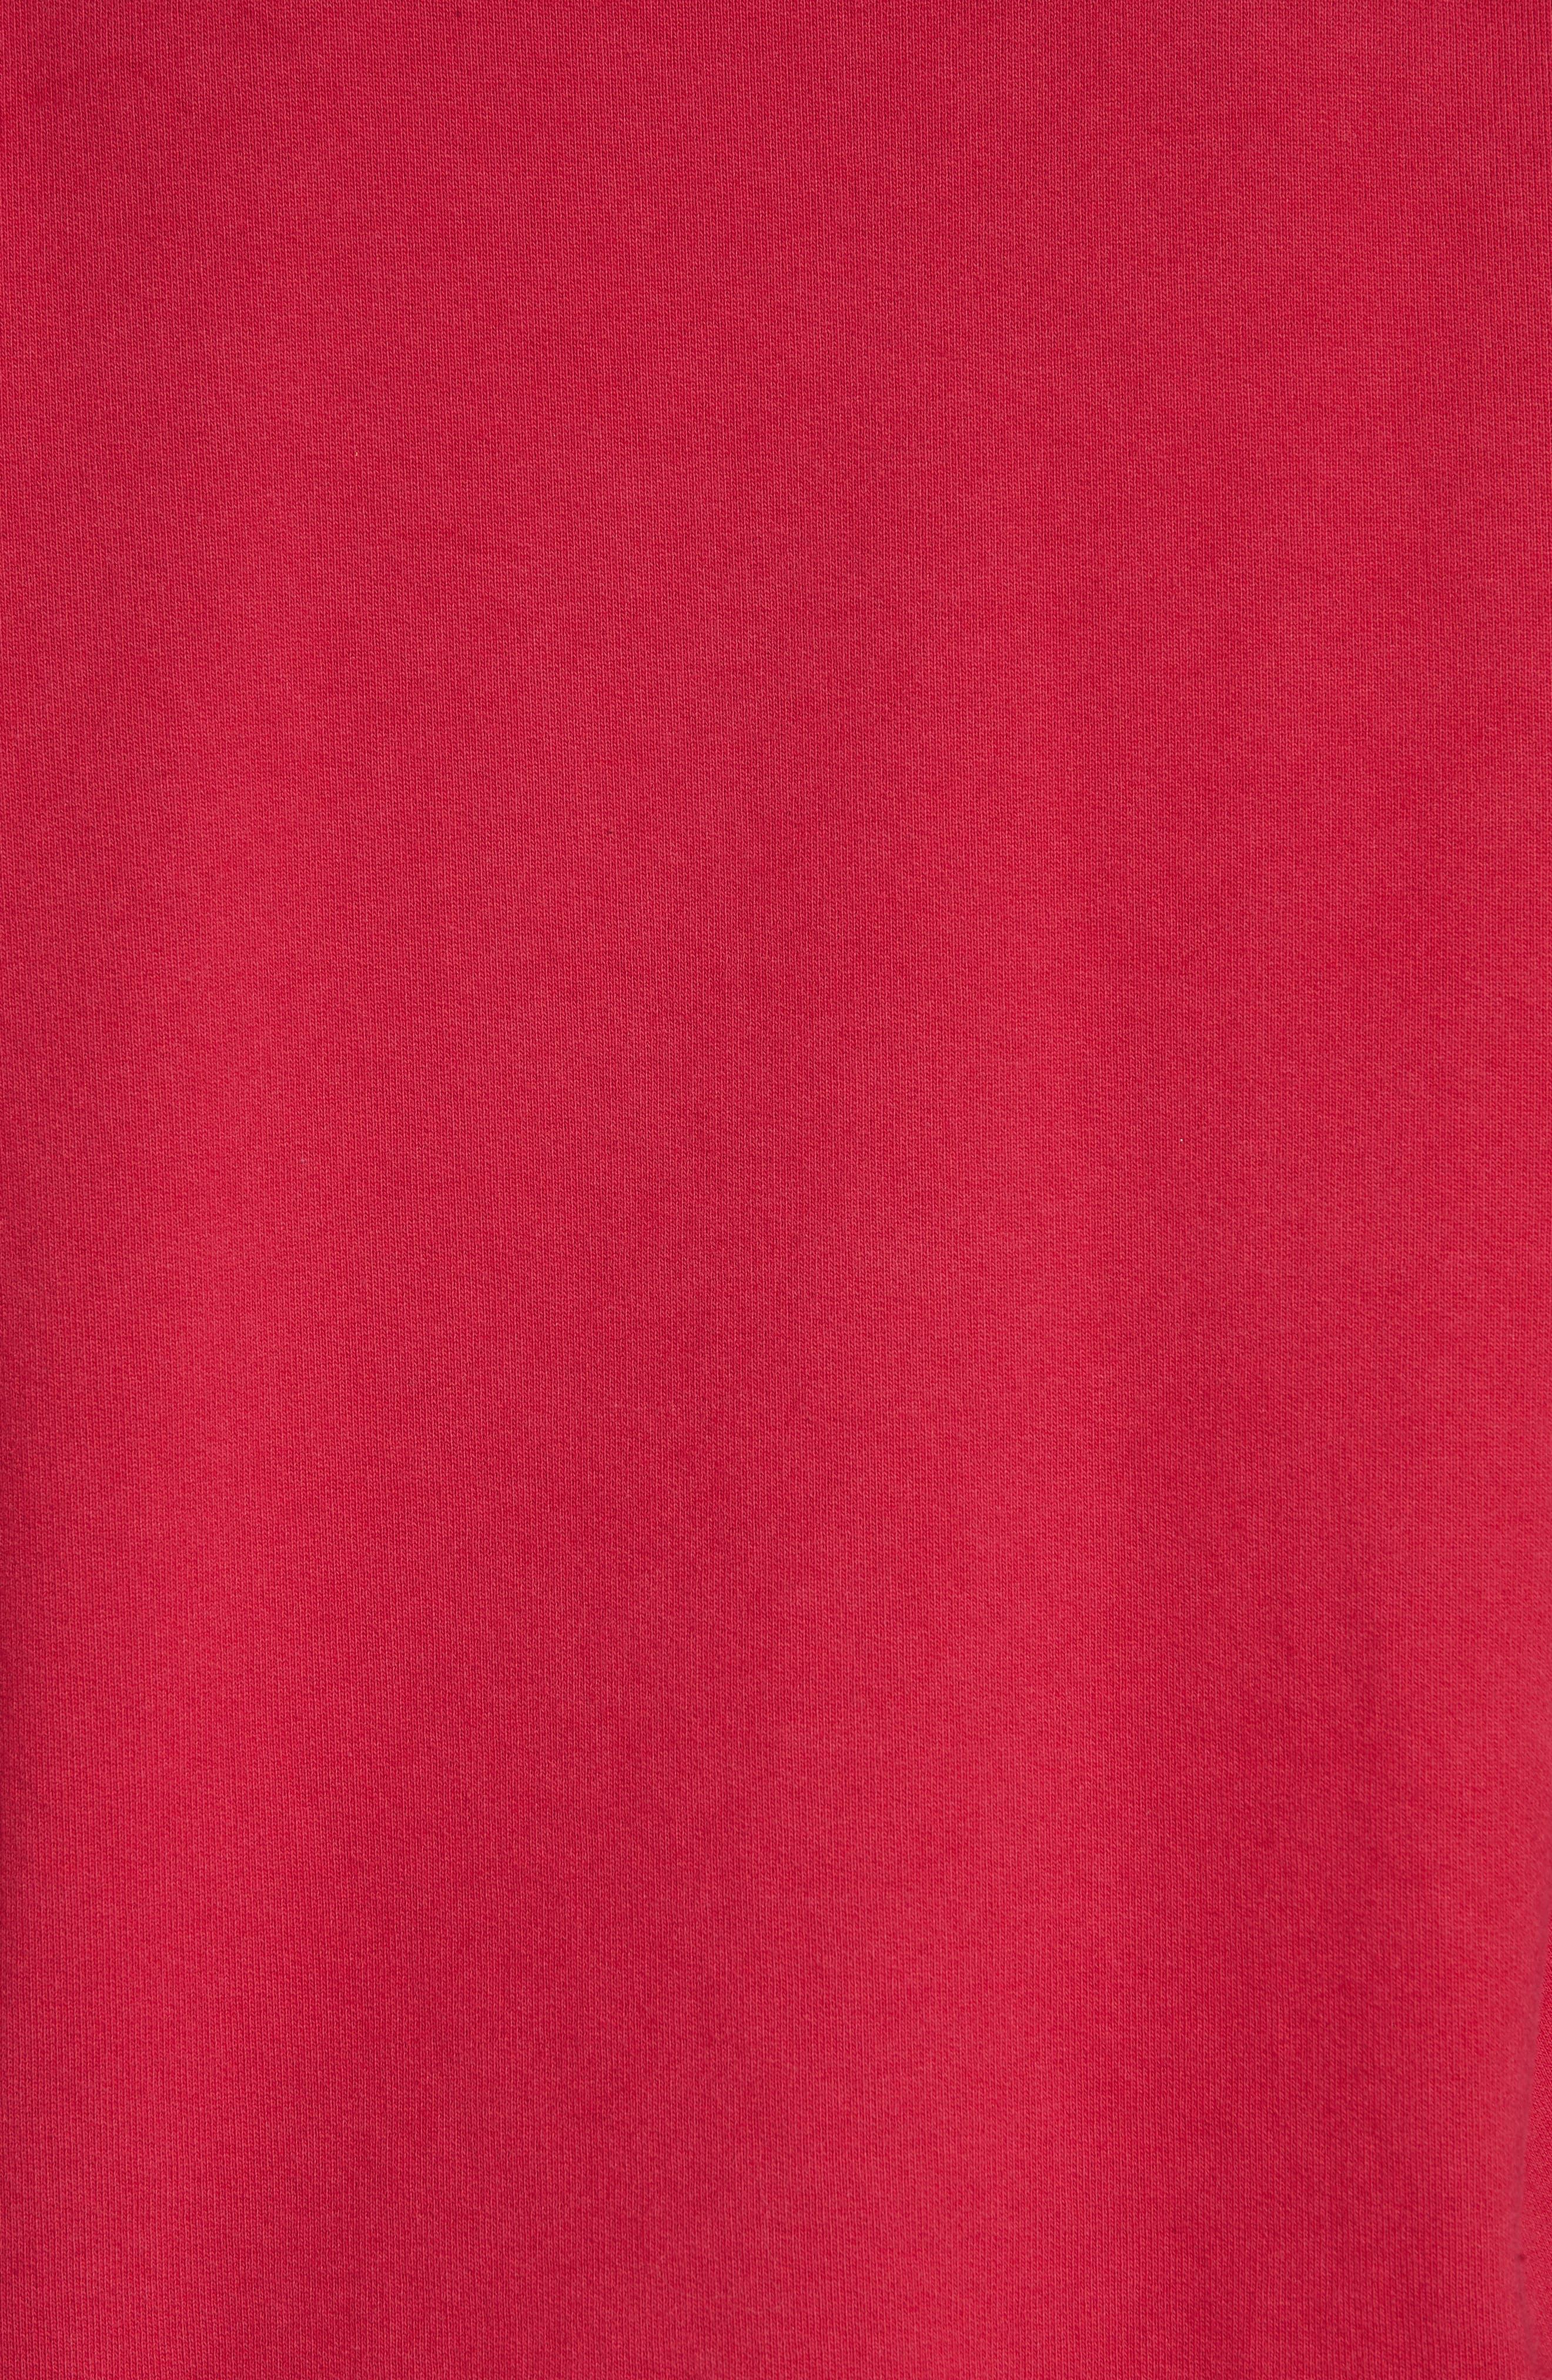 Crewneck Sweatshirt,                             Alternate thumbnail 5, color,                             CHERRY